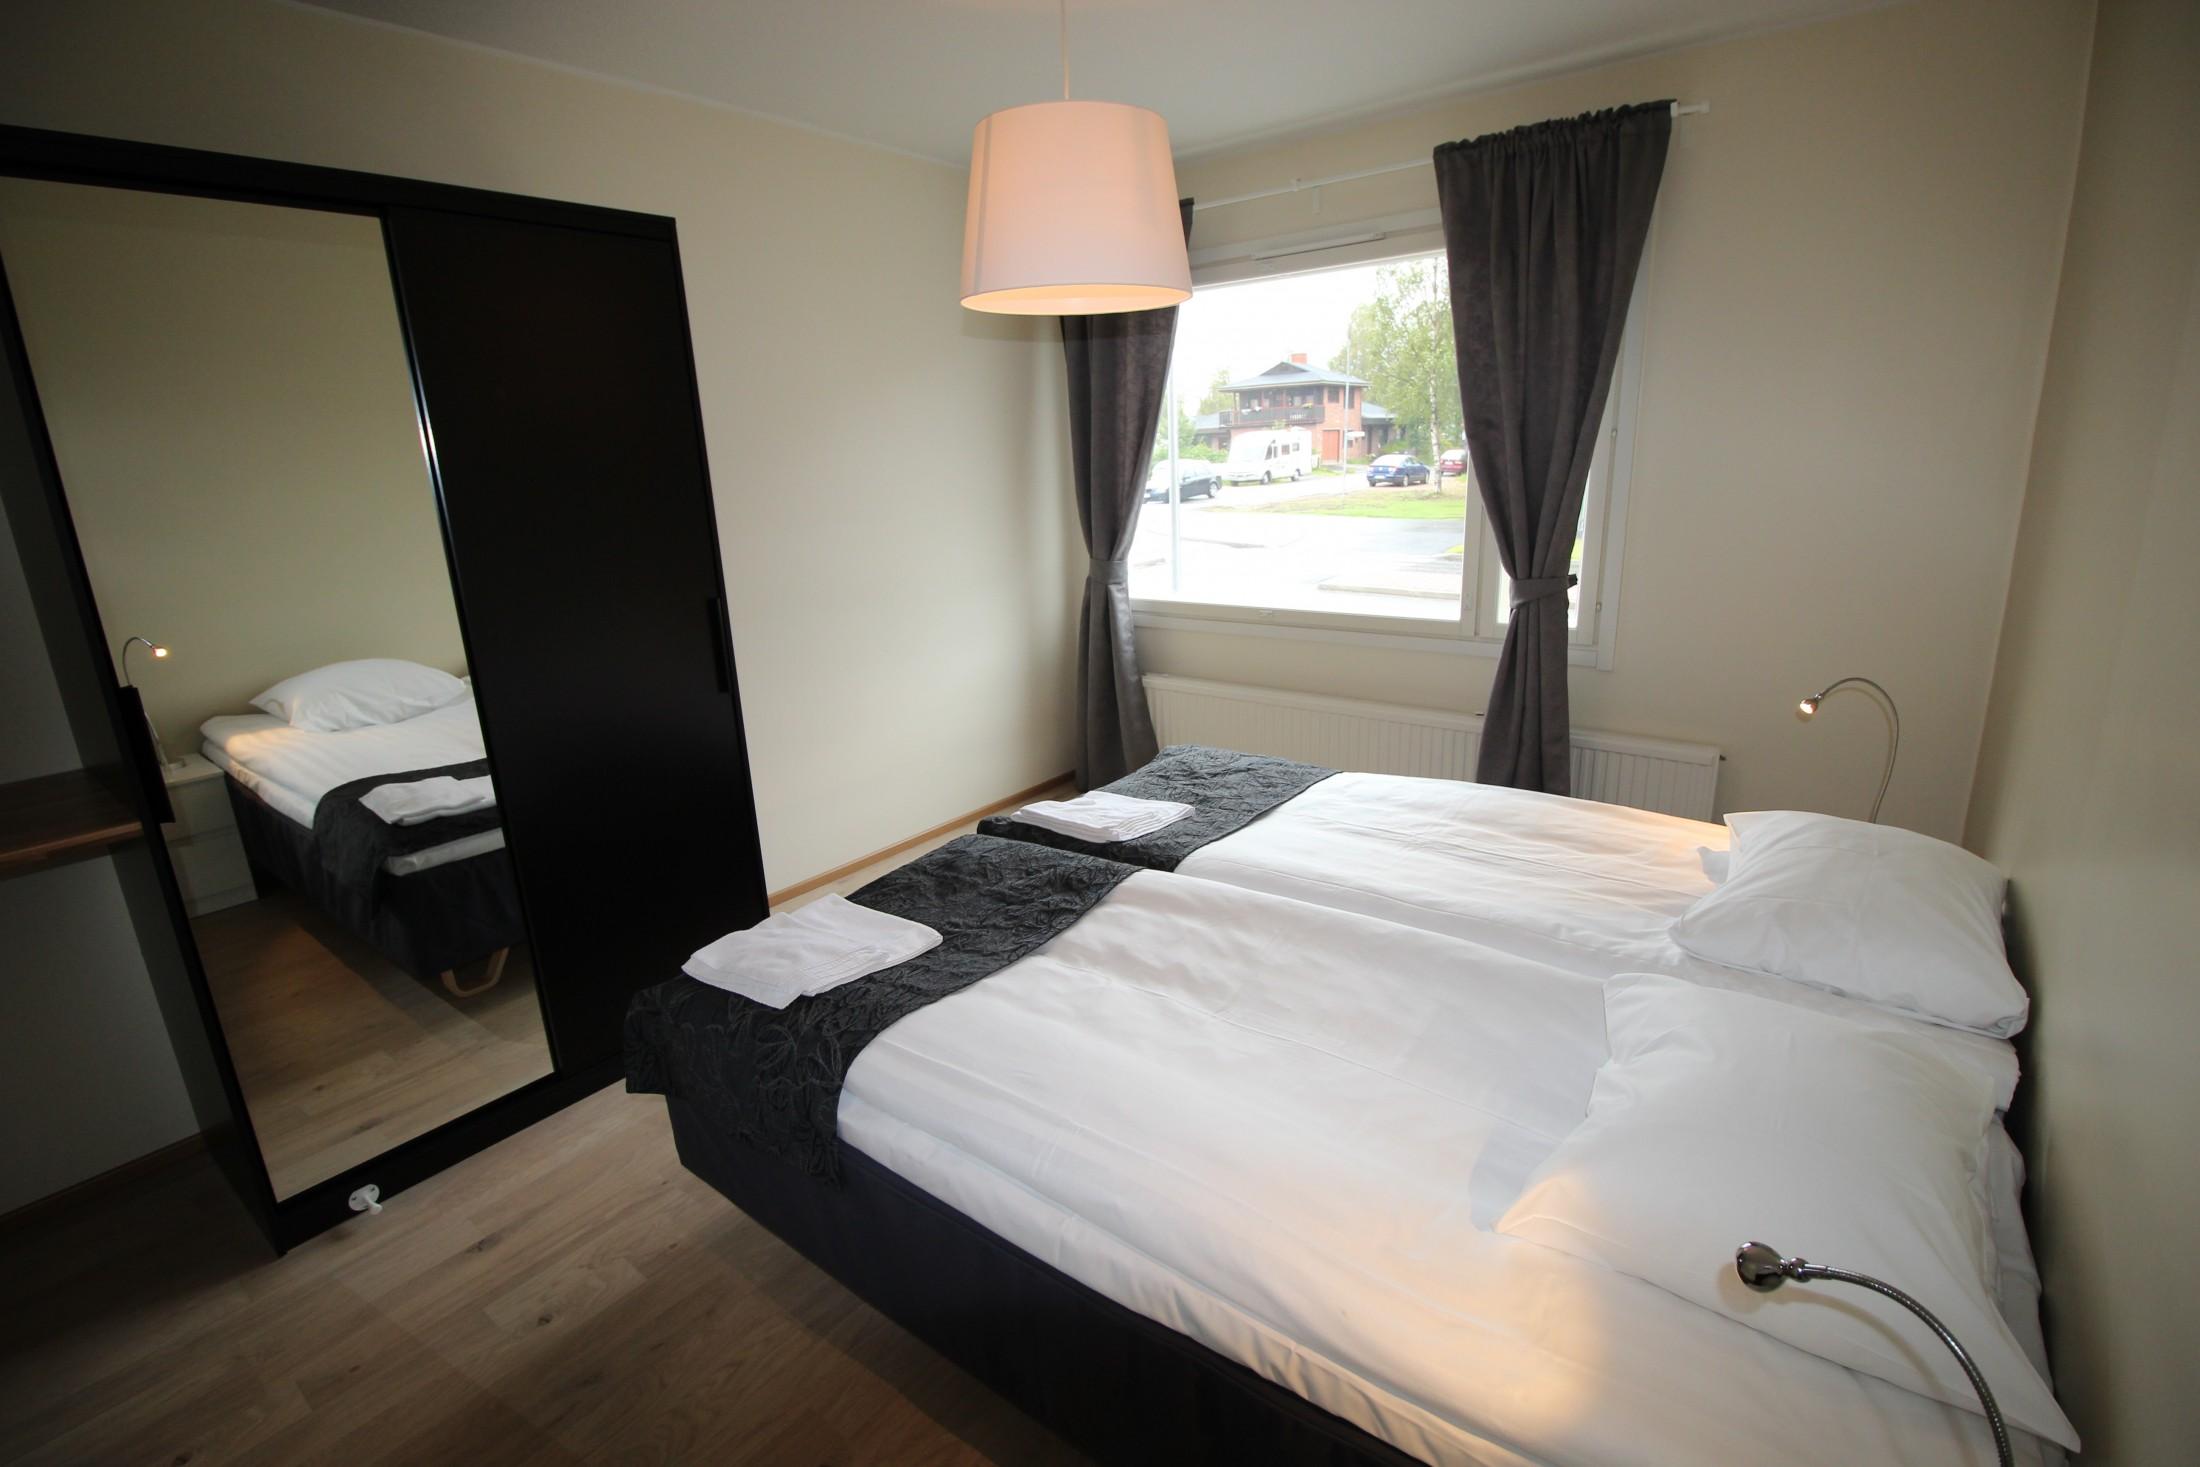 2 Bed Bedroom three bed rooms apartment koski - hotel aakenus rovaniemi in